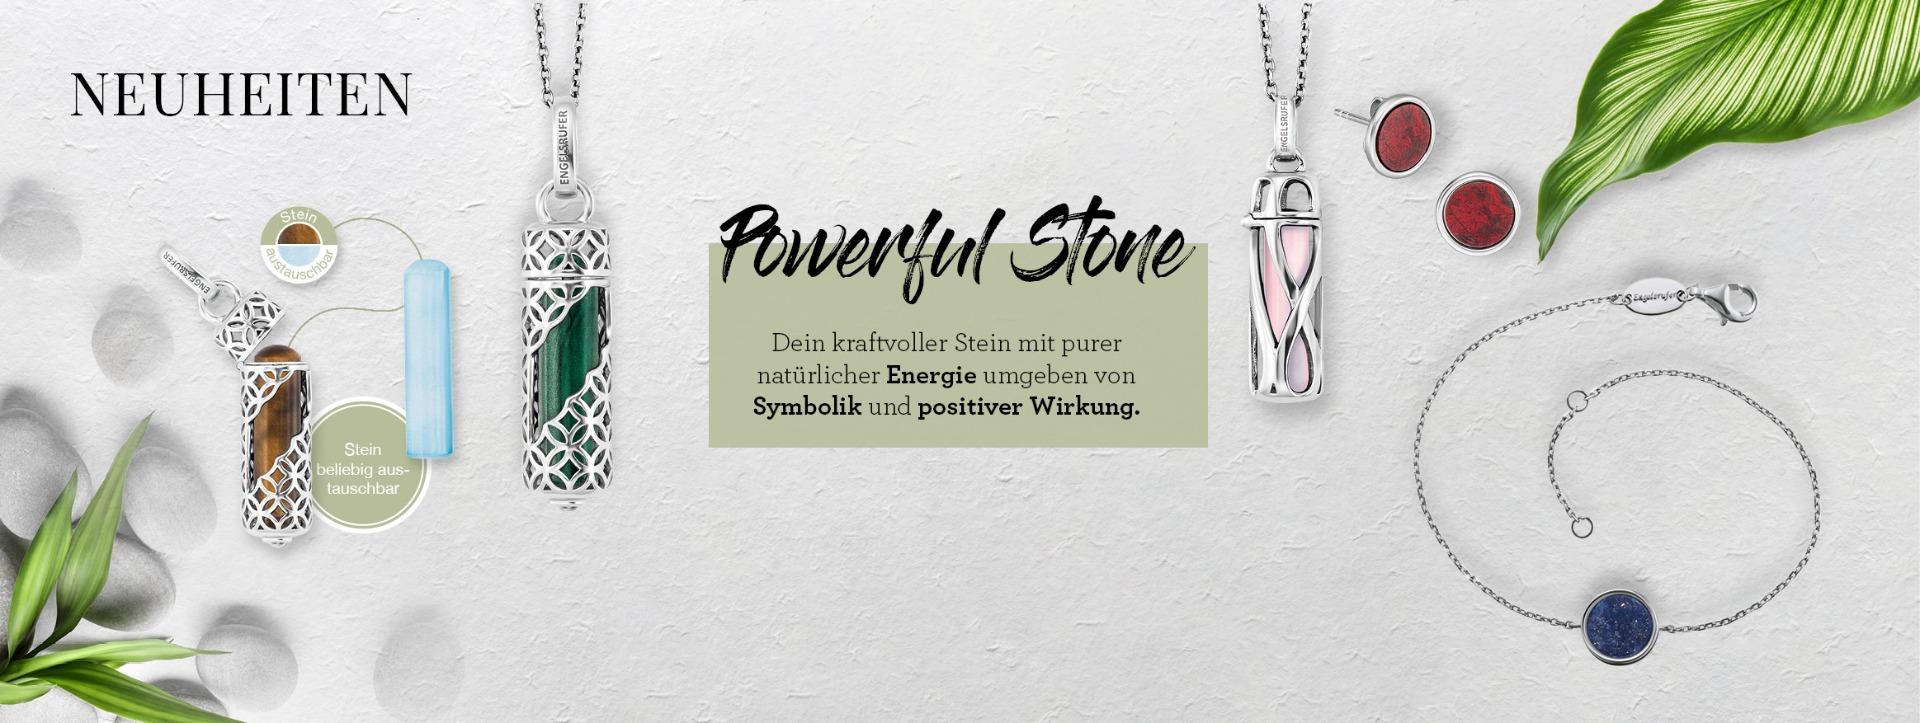 Neu - unsere Powerful Stones